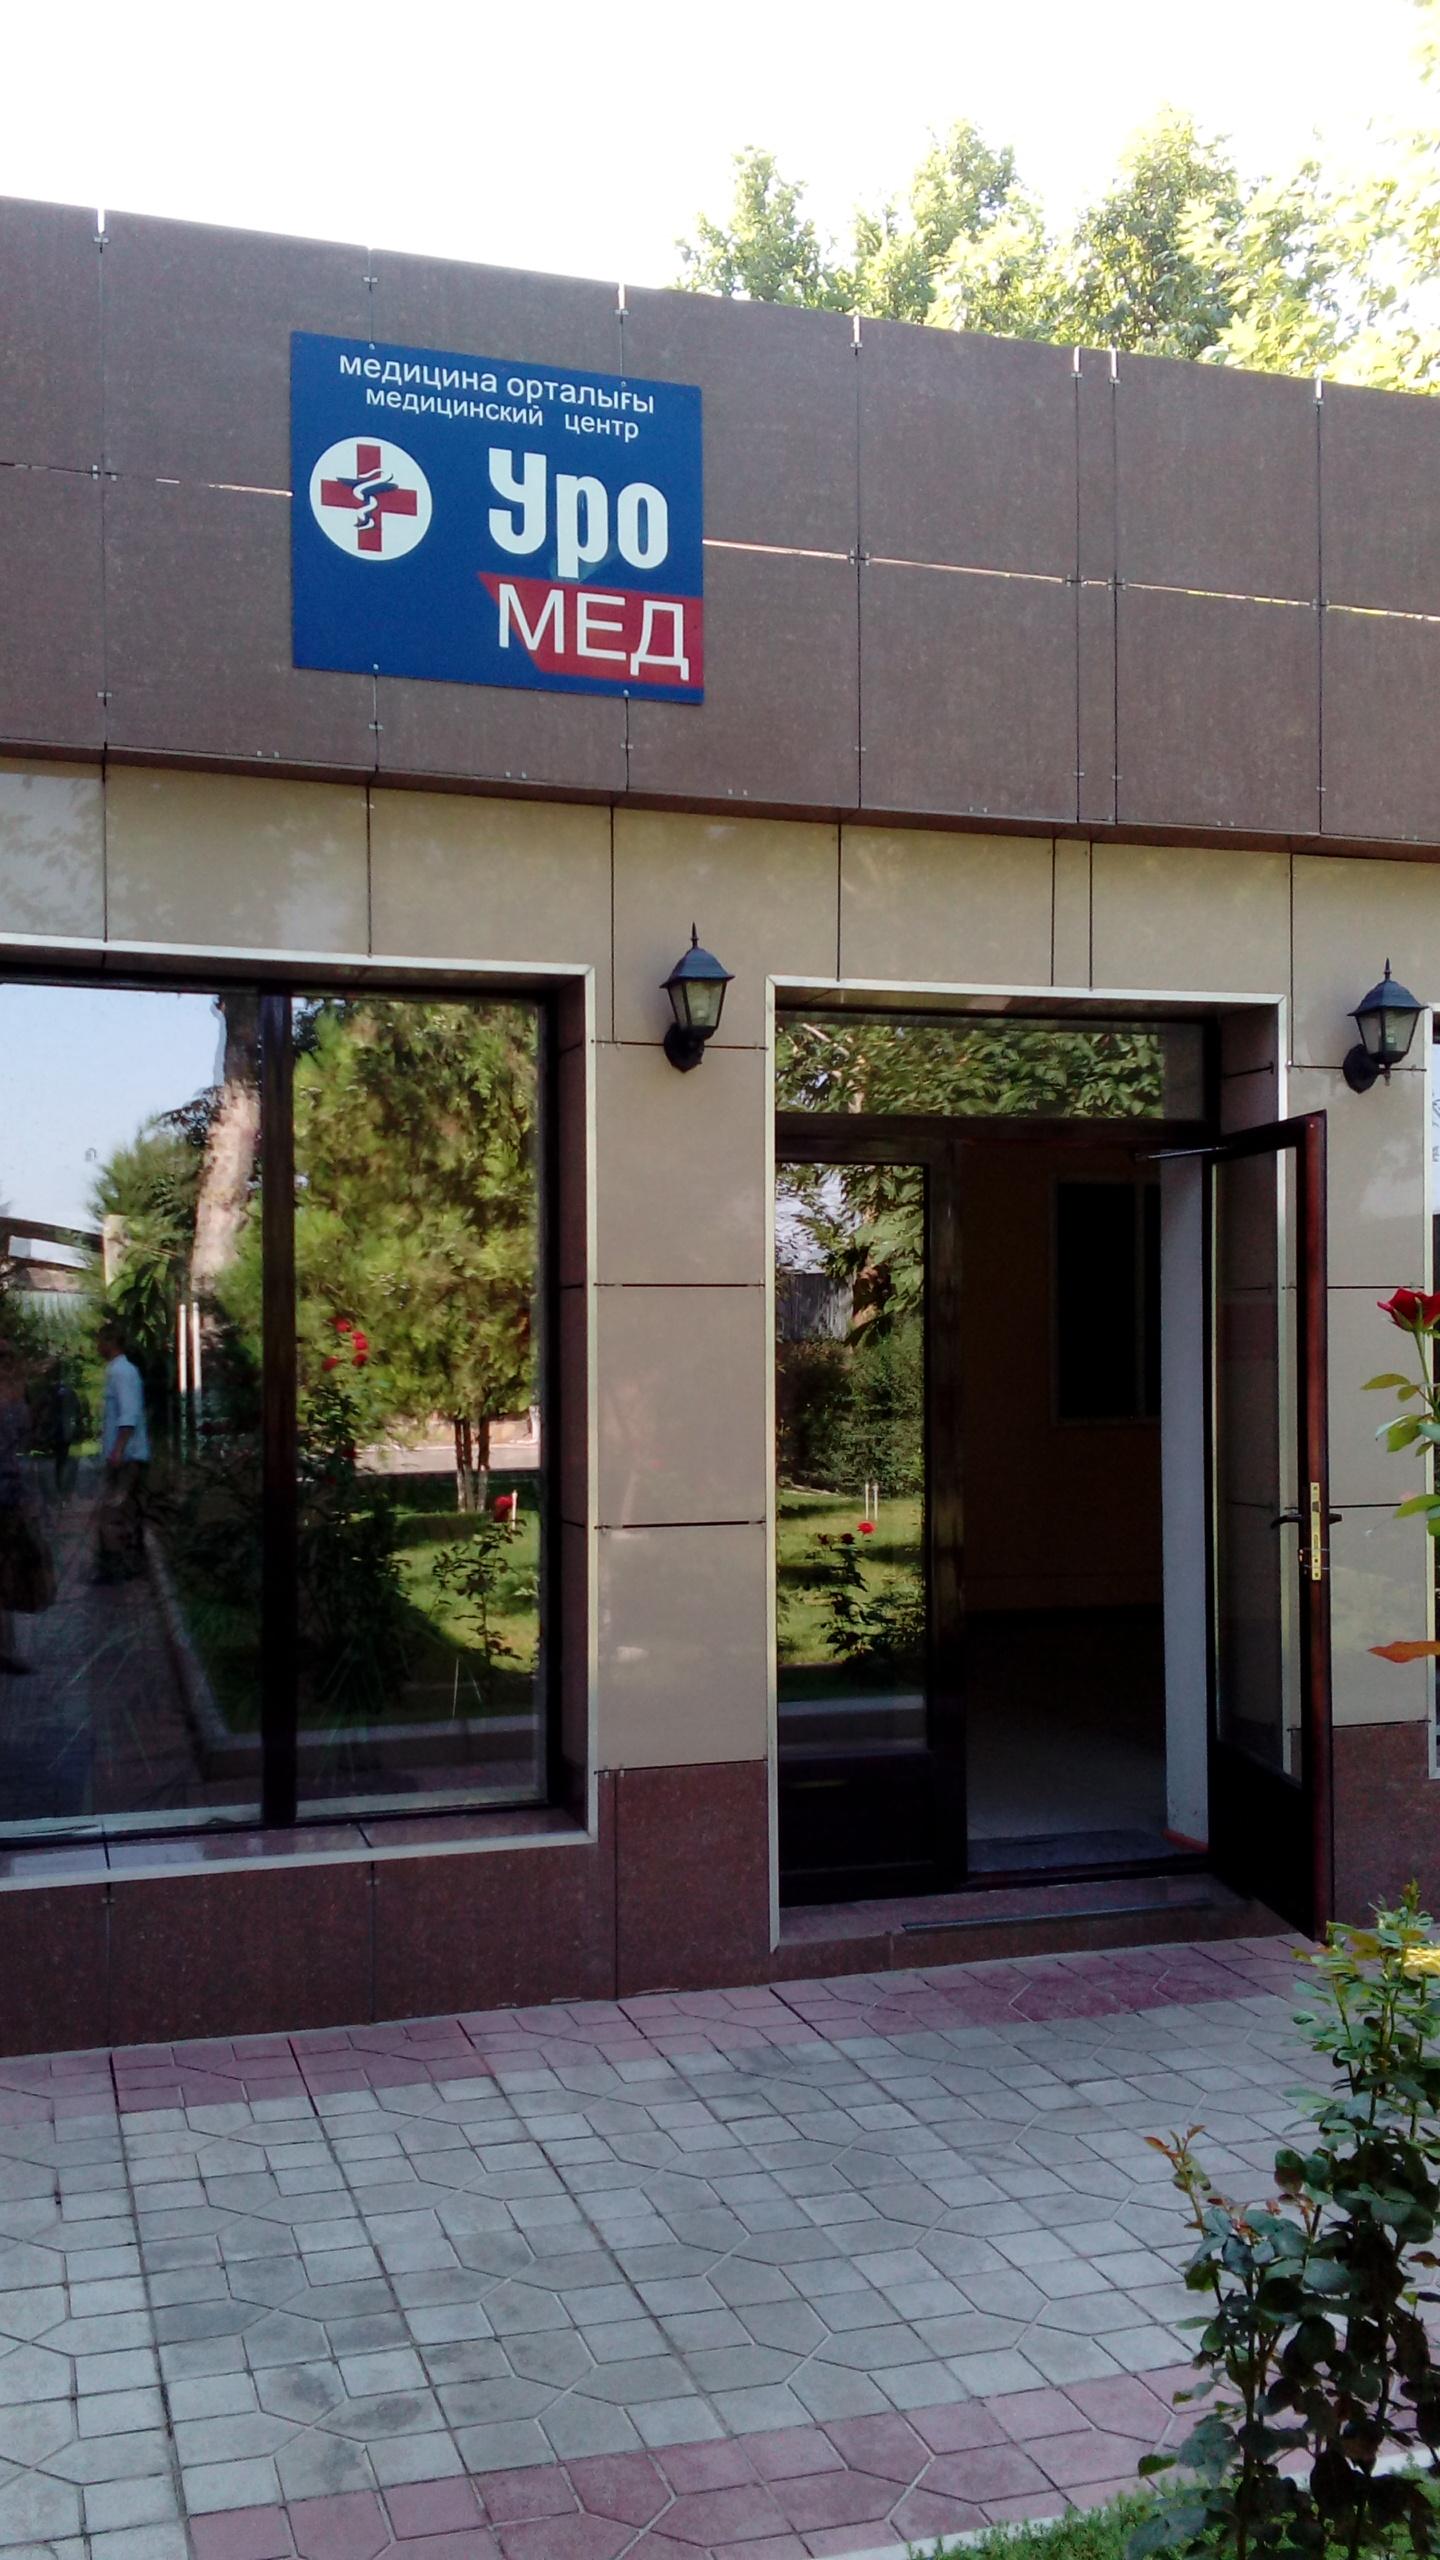 "Медицинский центр ""УРО МЕД"""